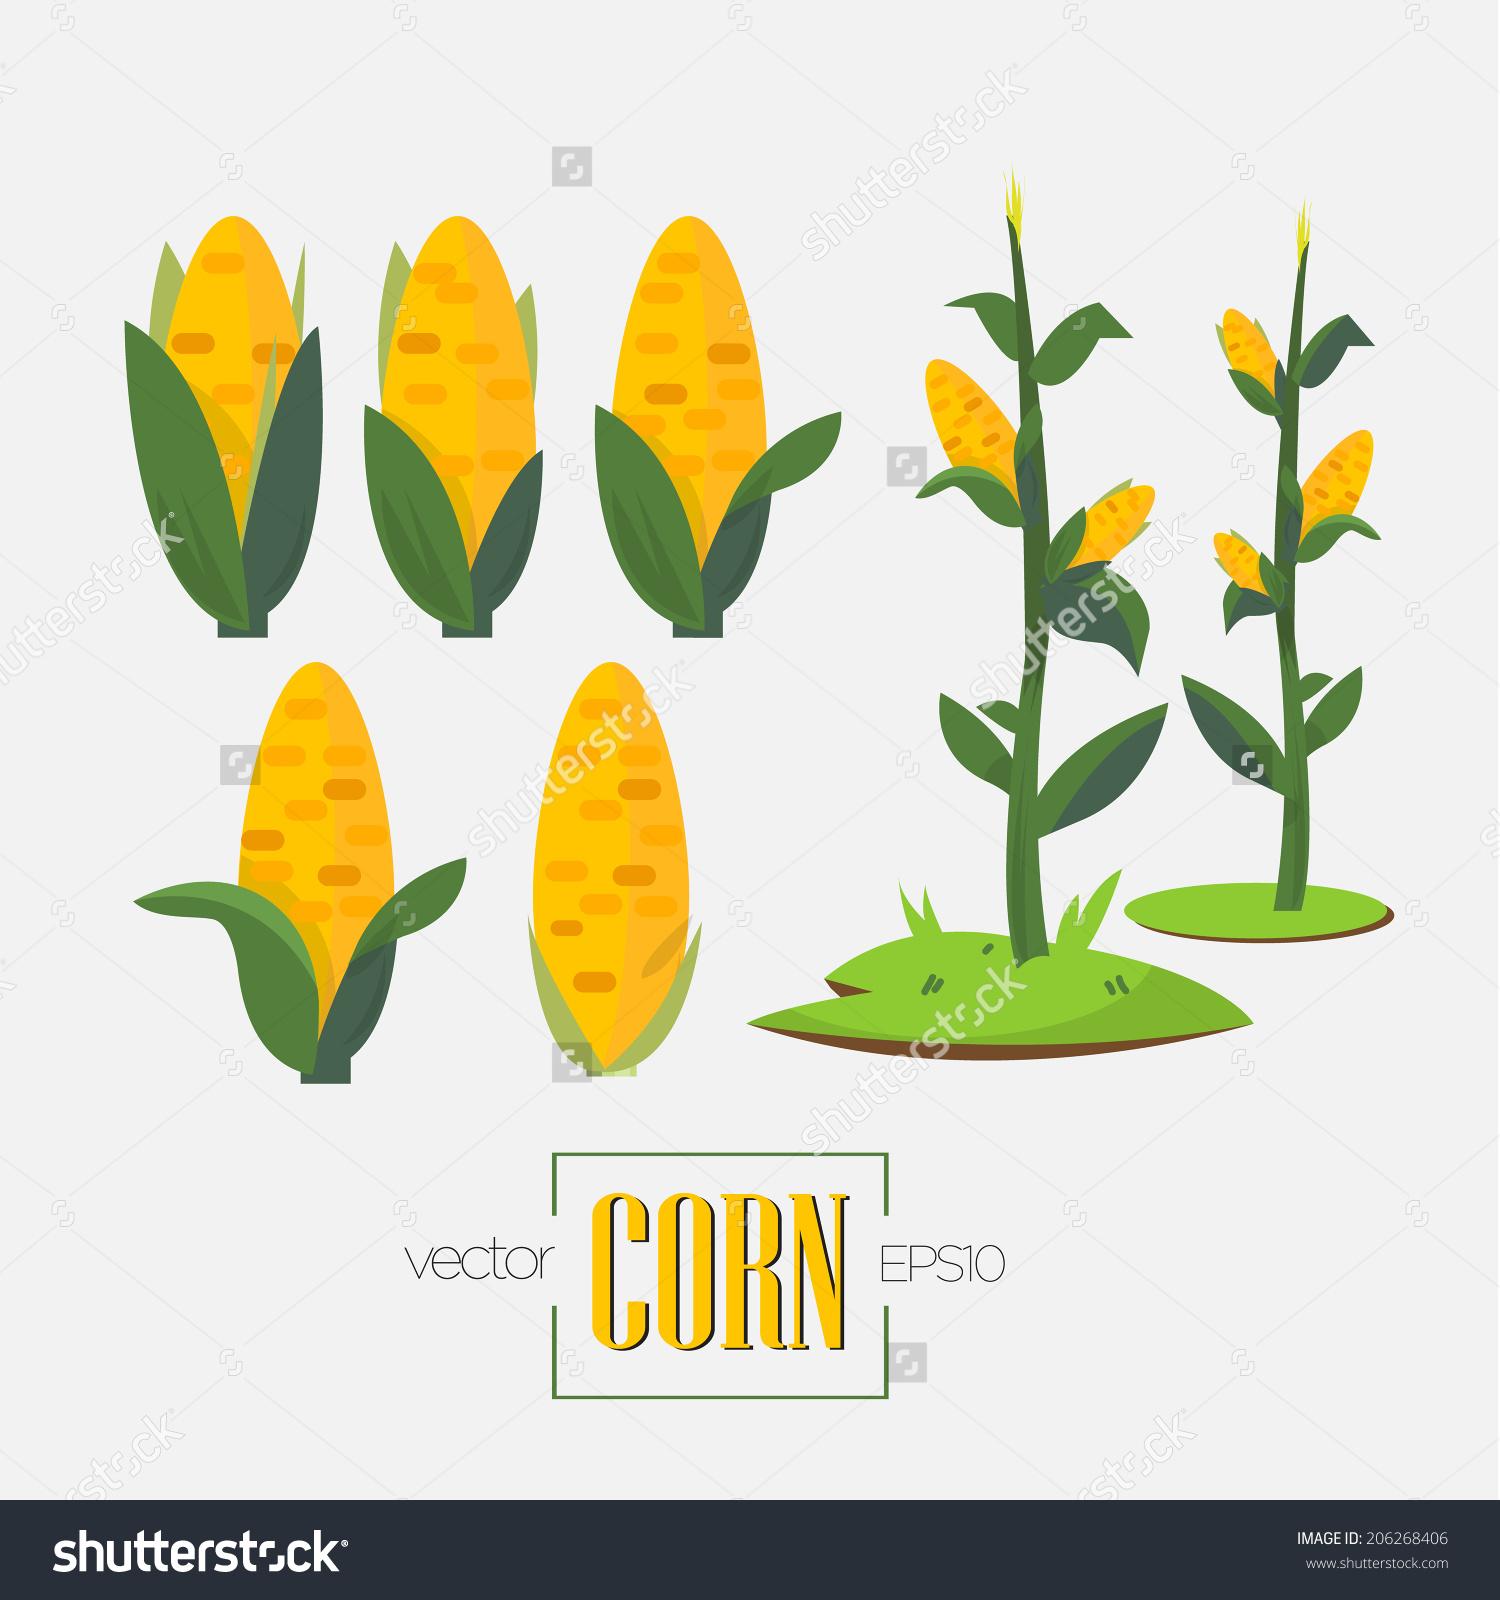 Corns Corn Tree Vector Illustration Stock Vector 206268406.